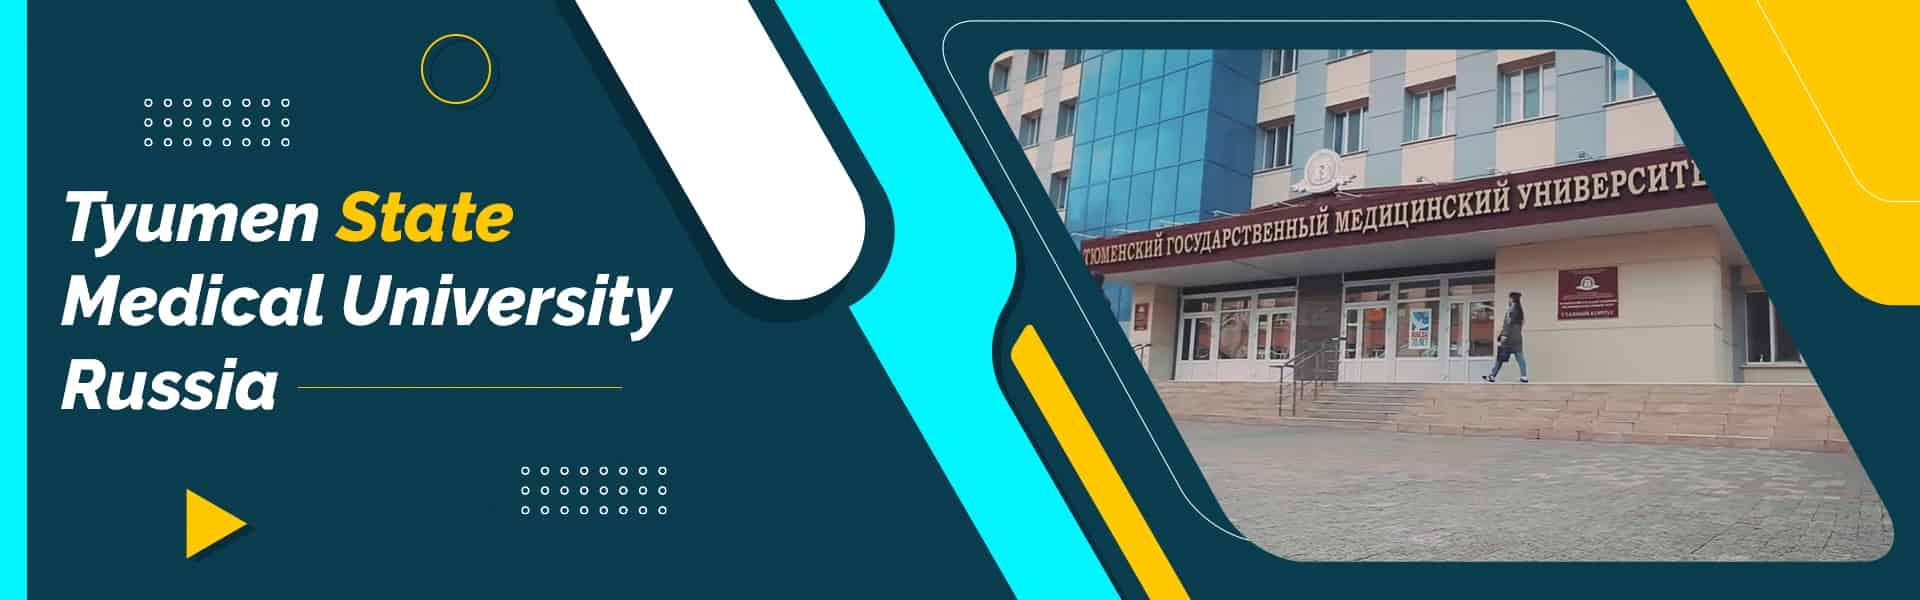 Tyumen State Medical University Russia